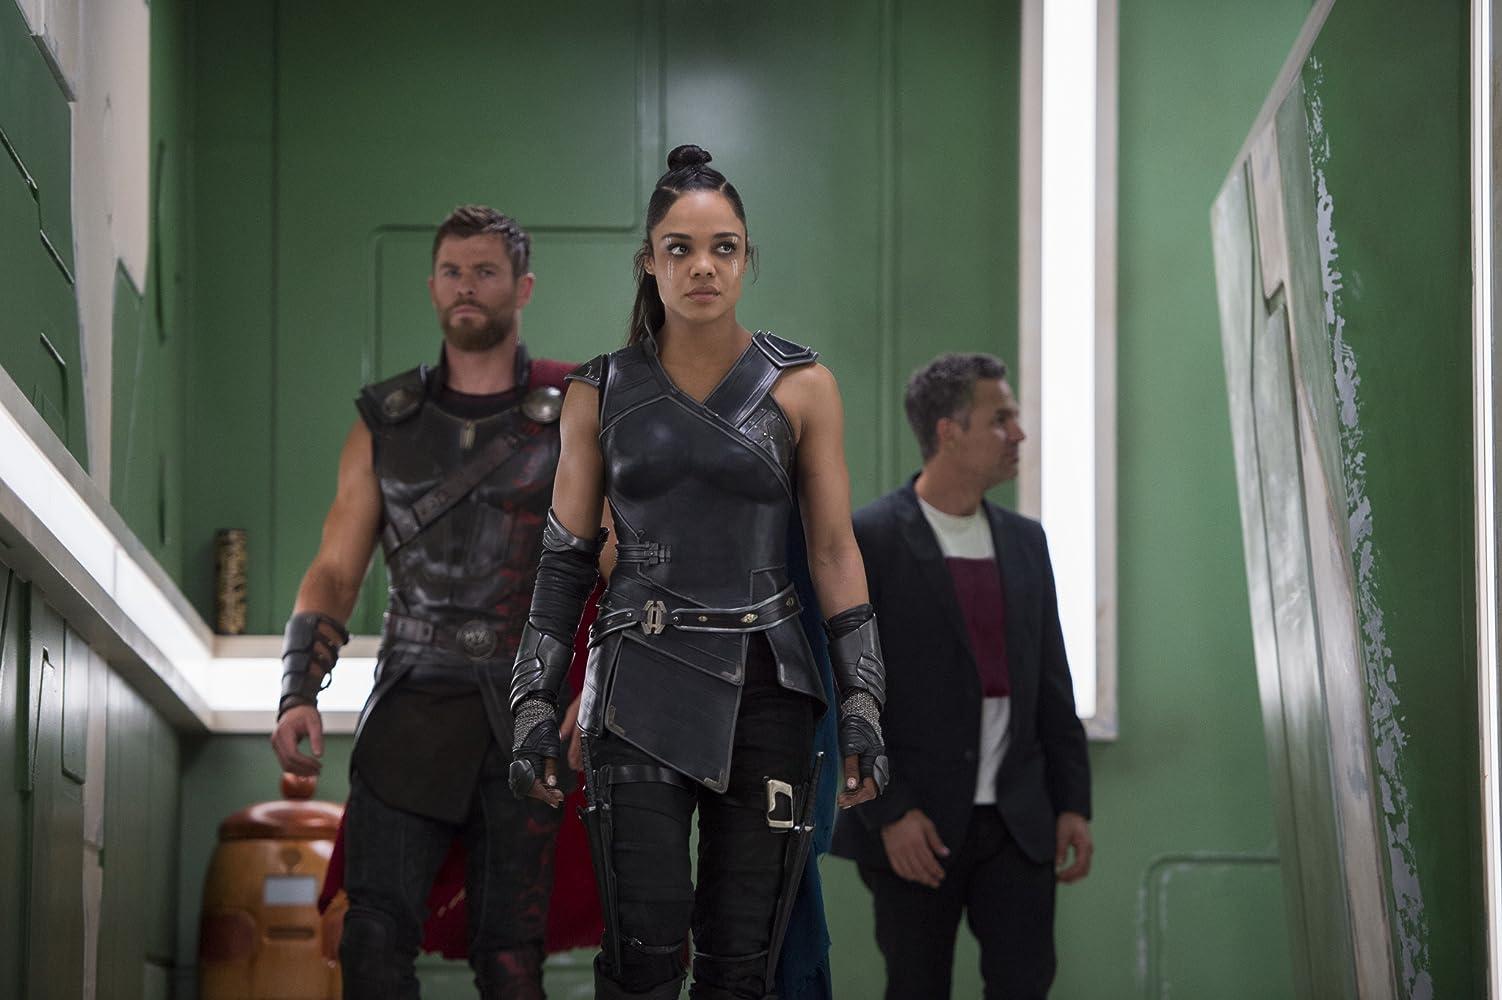 Mark Ruffalo, Chris Hemsworth, and Tessa Thompson in Thor: Ragnarok (2017)